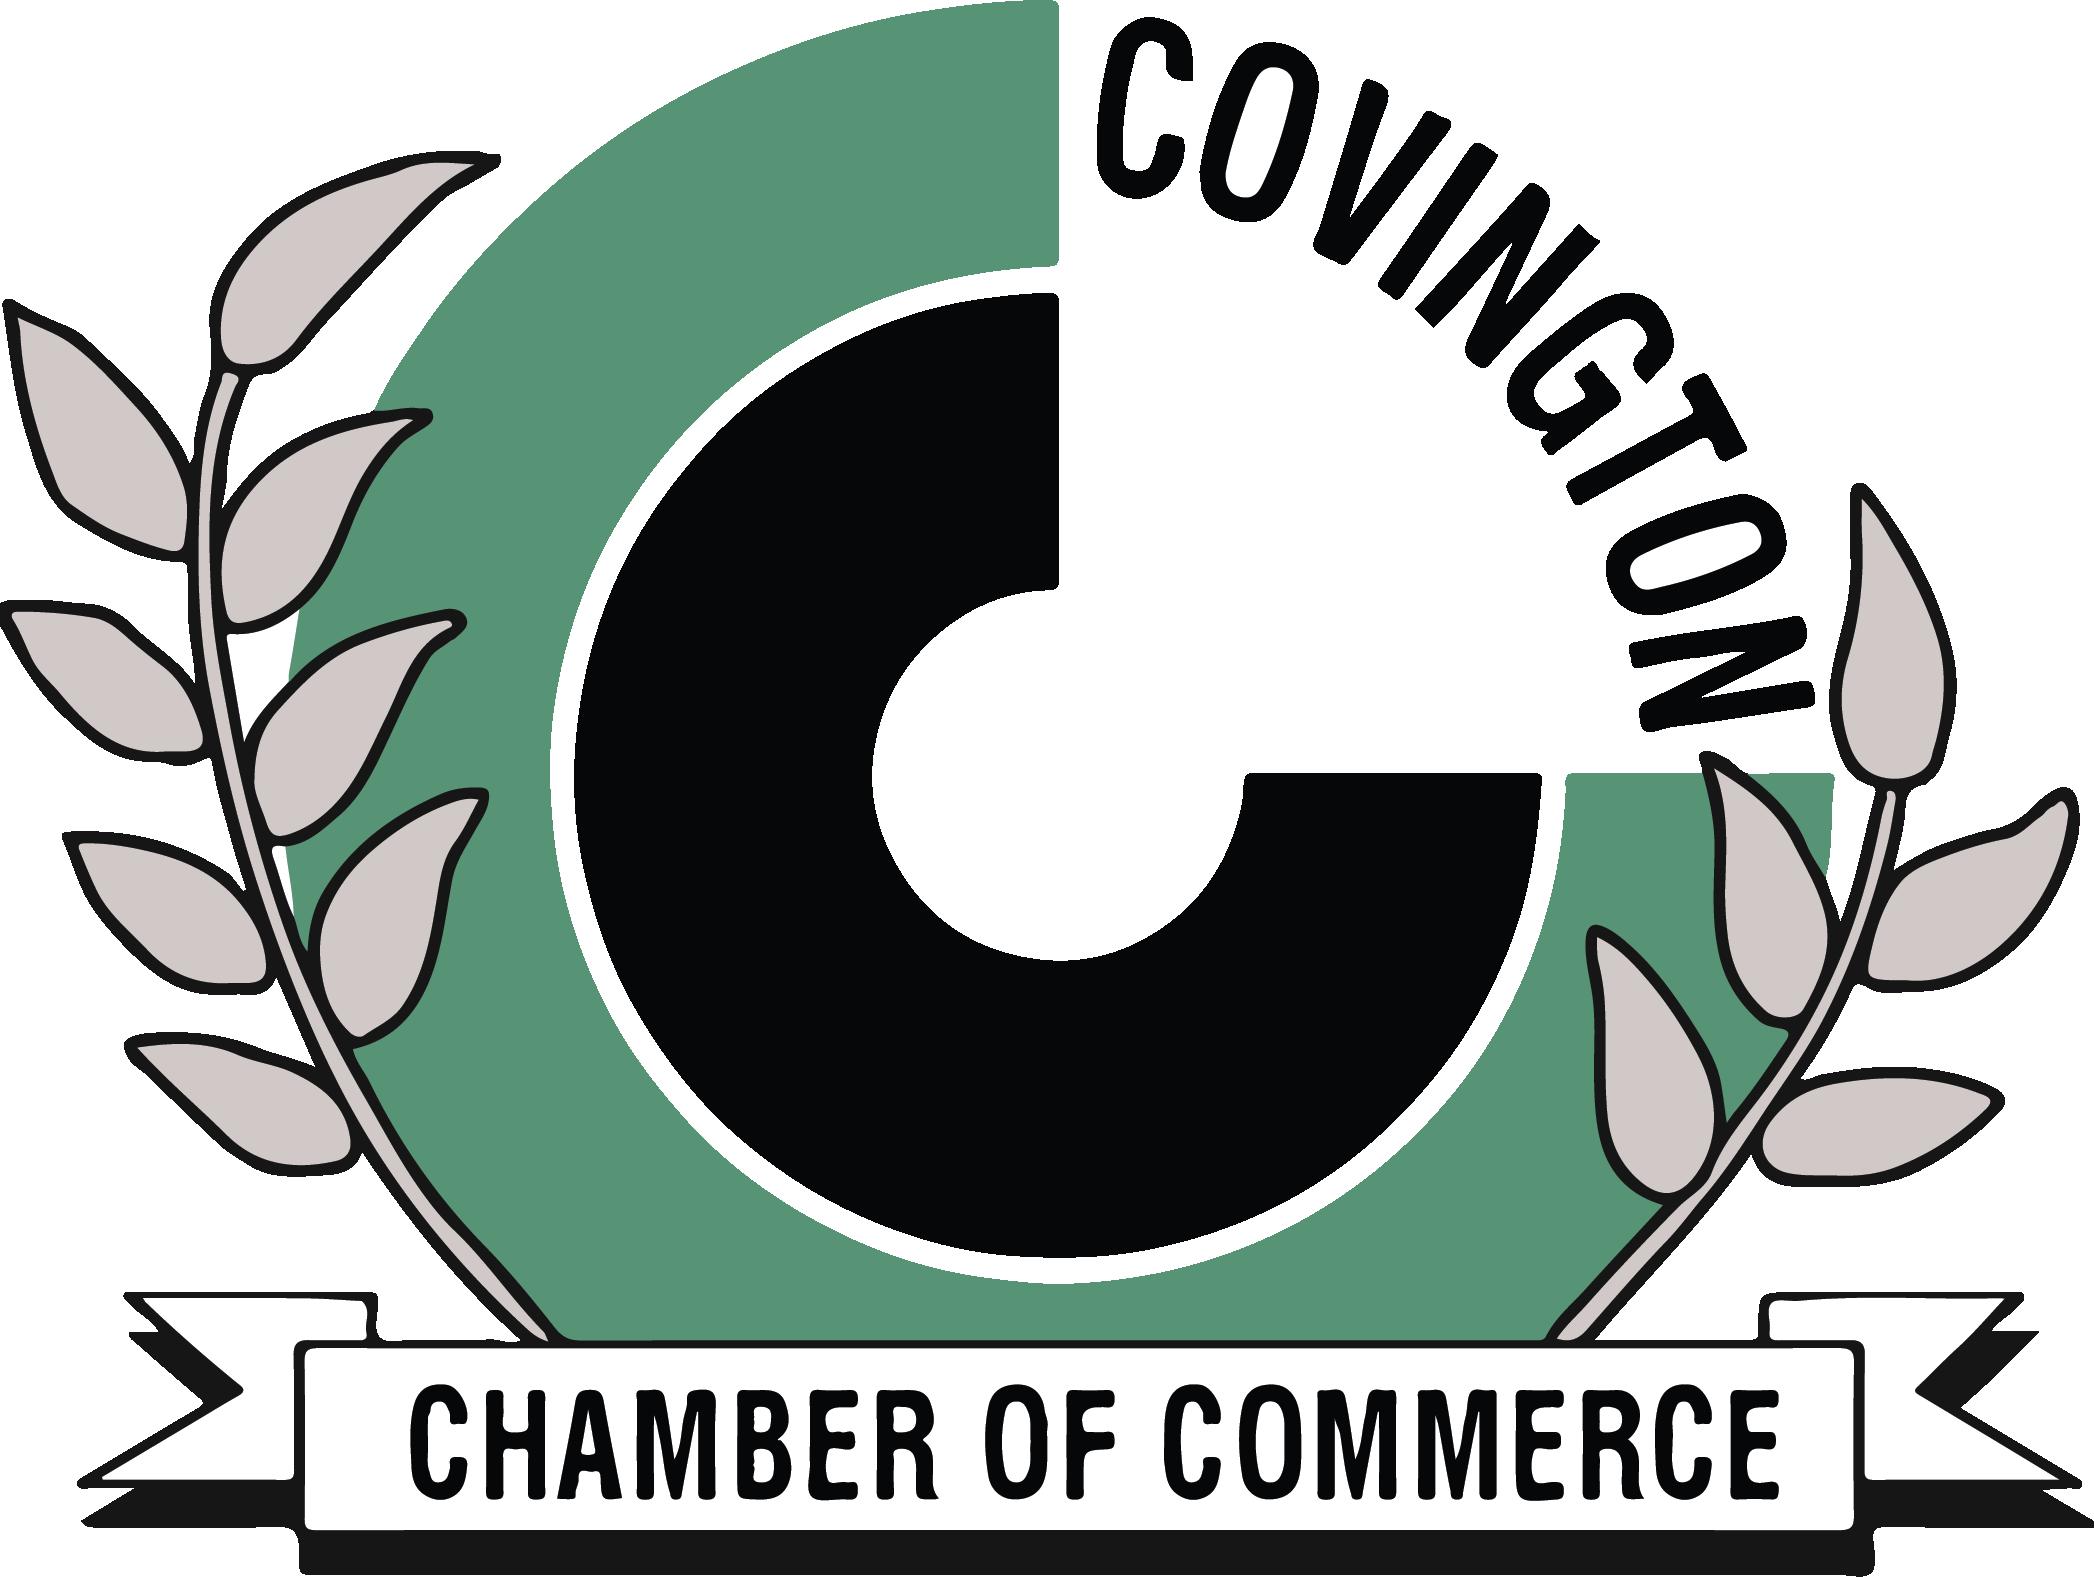 Covington WA Chamber of Commerce